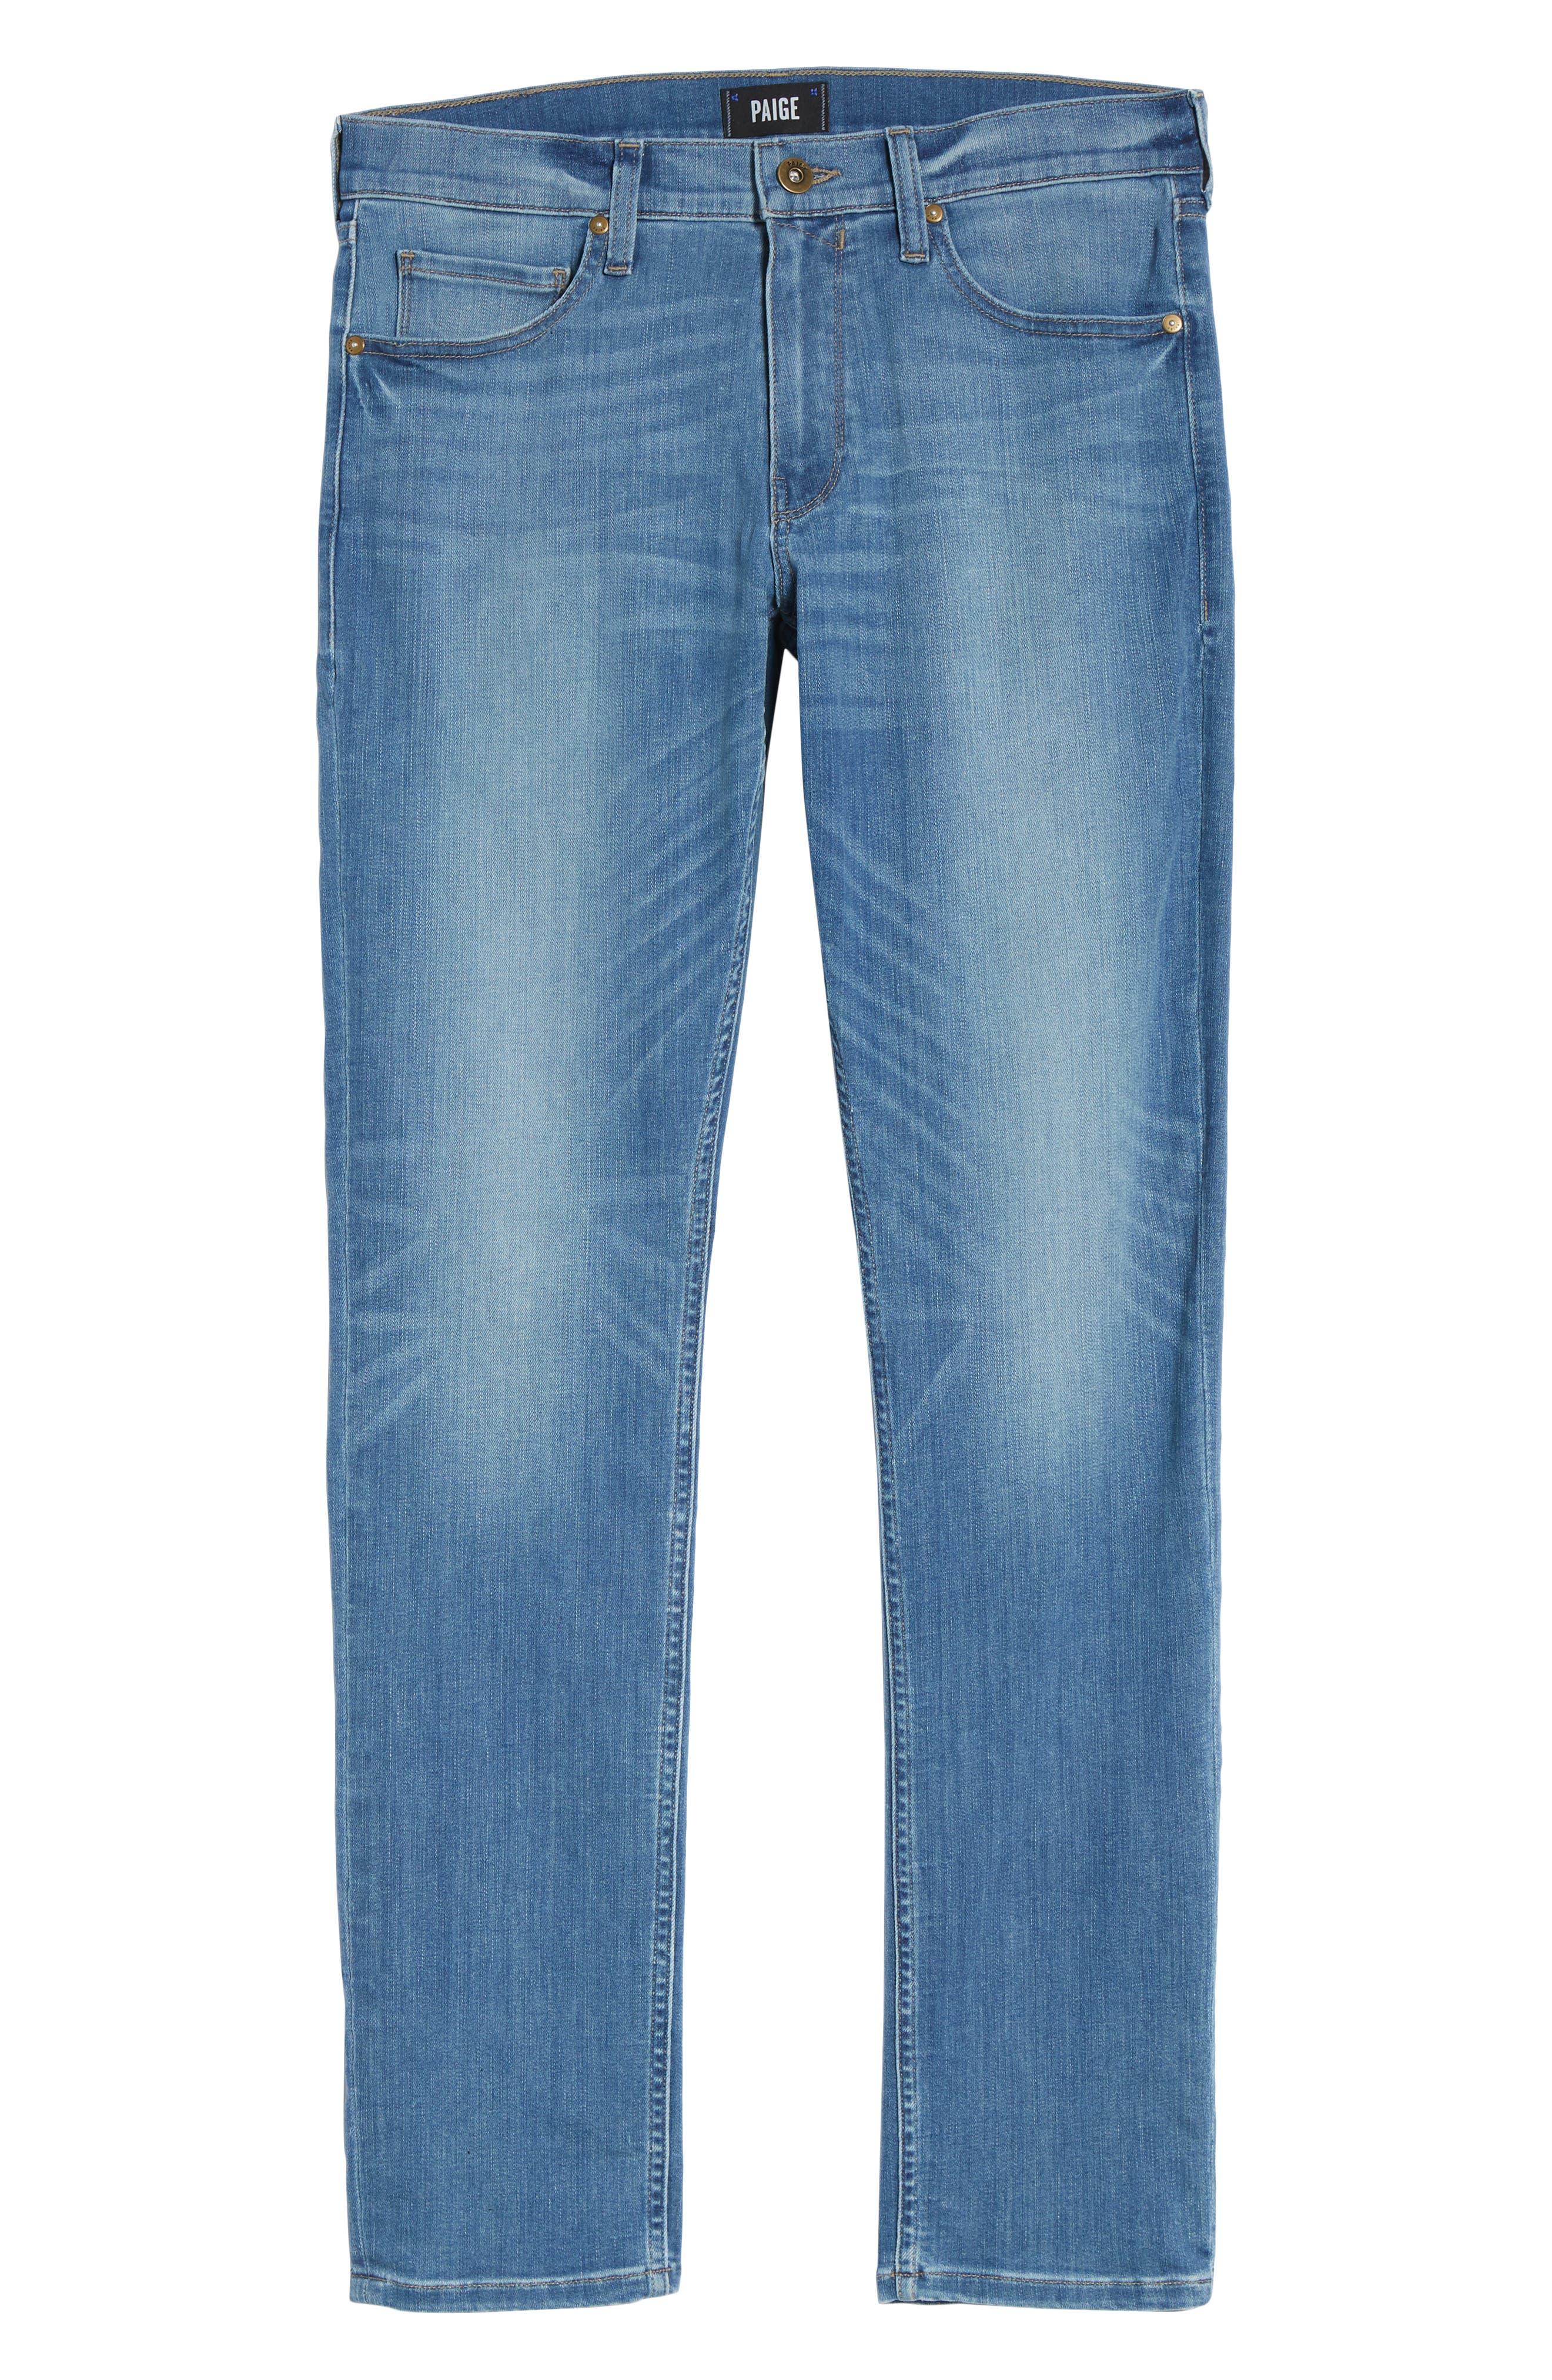 Transcend - Federal Slim Straight Leg Jeans,                             Alternate thumbnail 6, color,                             Hammonds